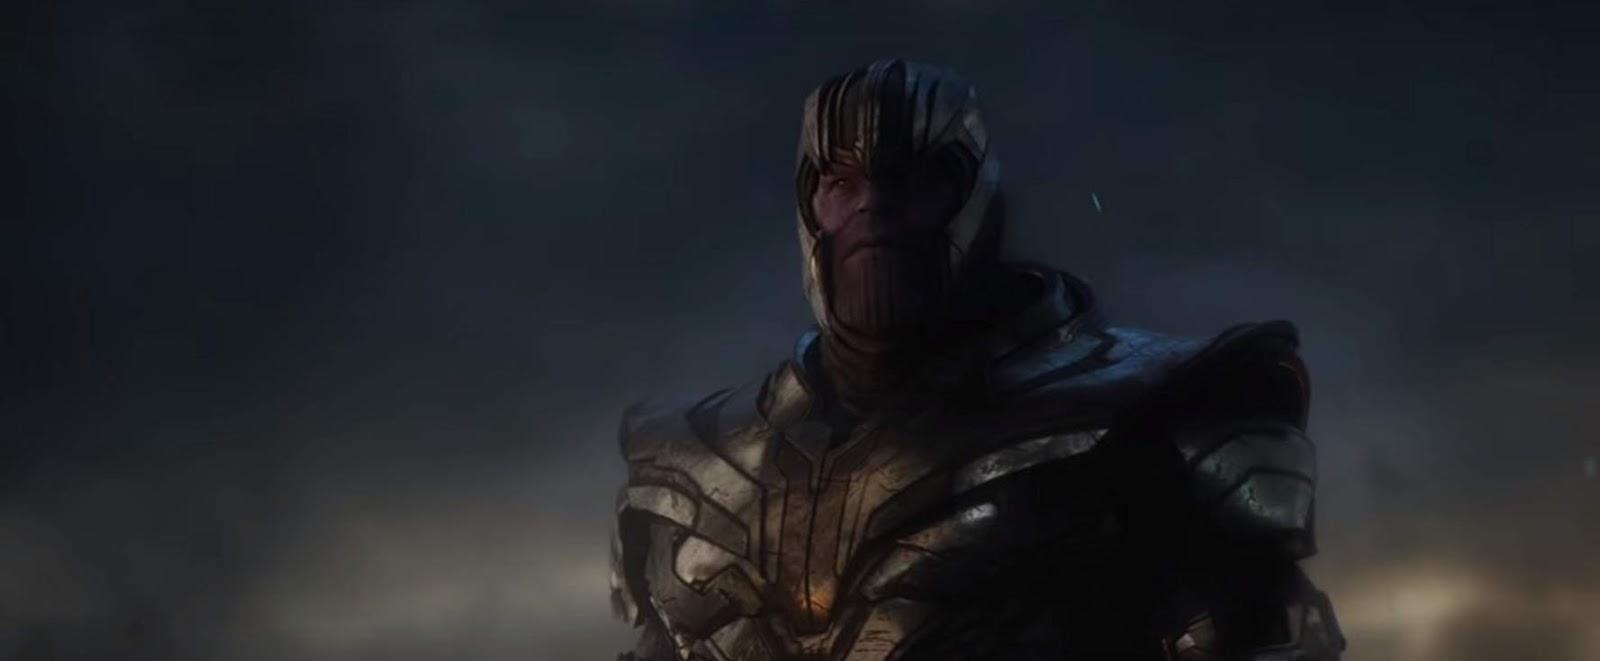 download avengers endgame 2019 full movie sub indo